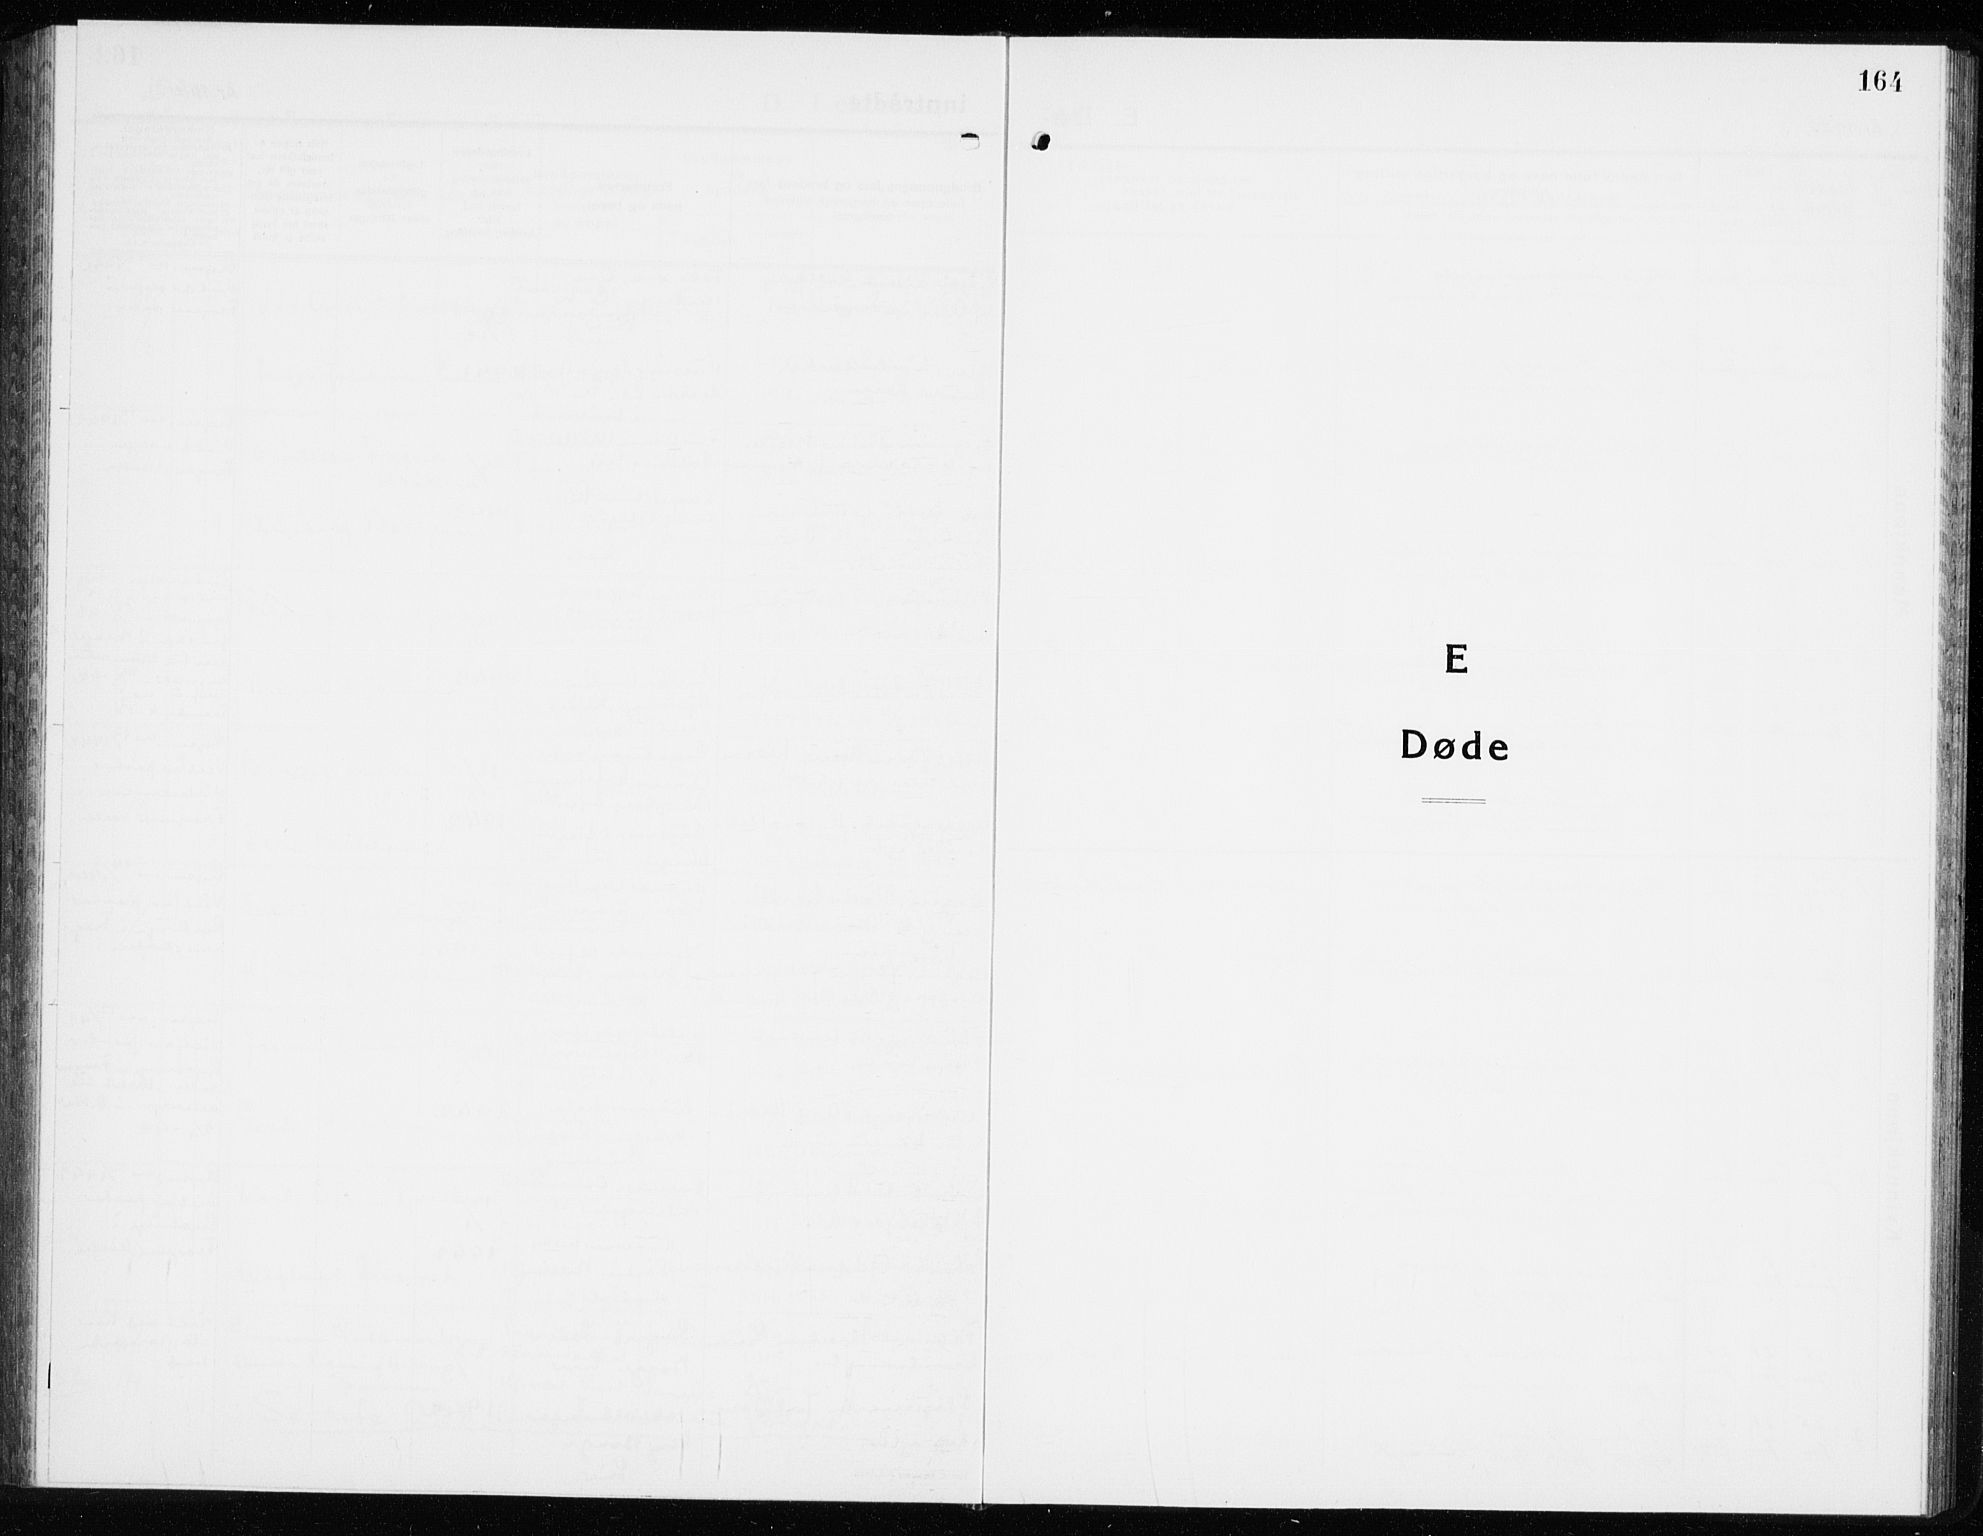 SAKO, Lier kirkebøker, G/Gb/L0005: Klokkerbok nr. II 5, 1932-1942, s. 164